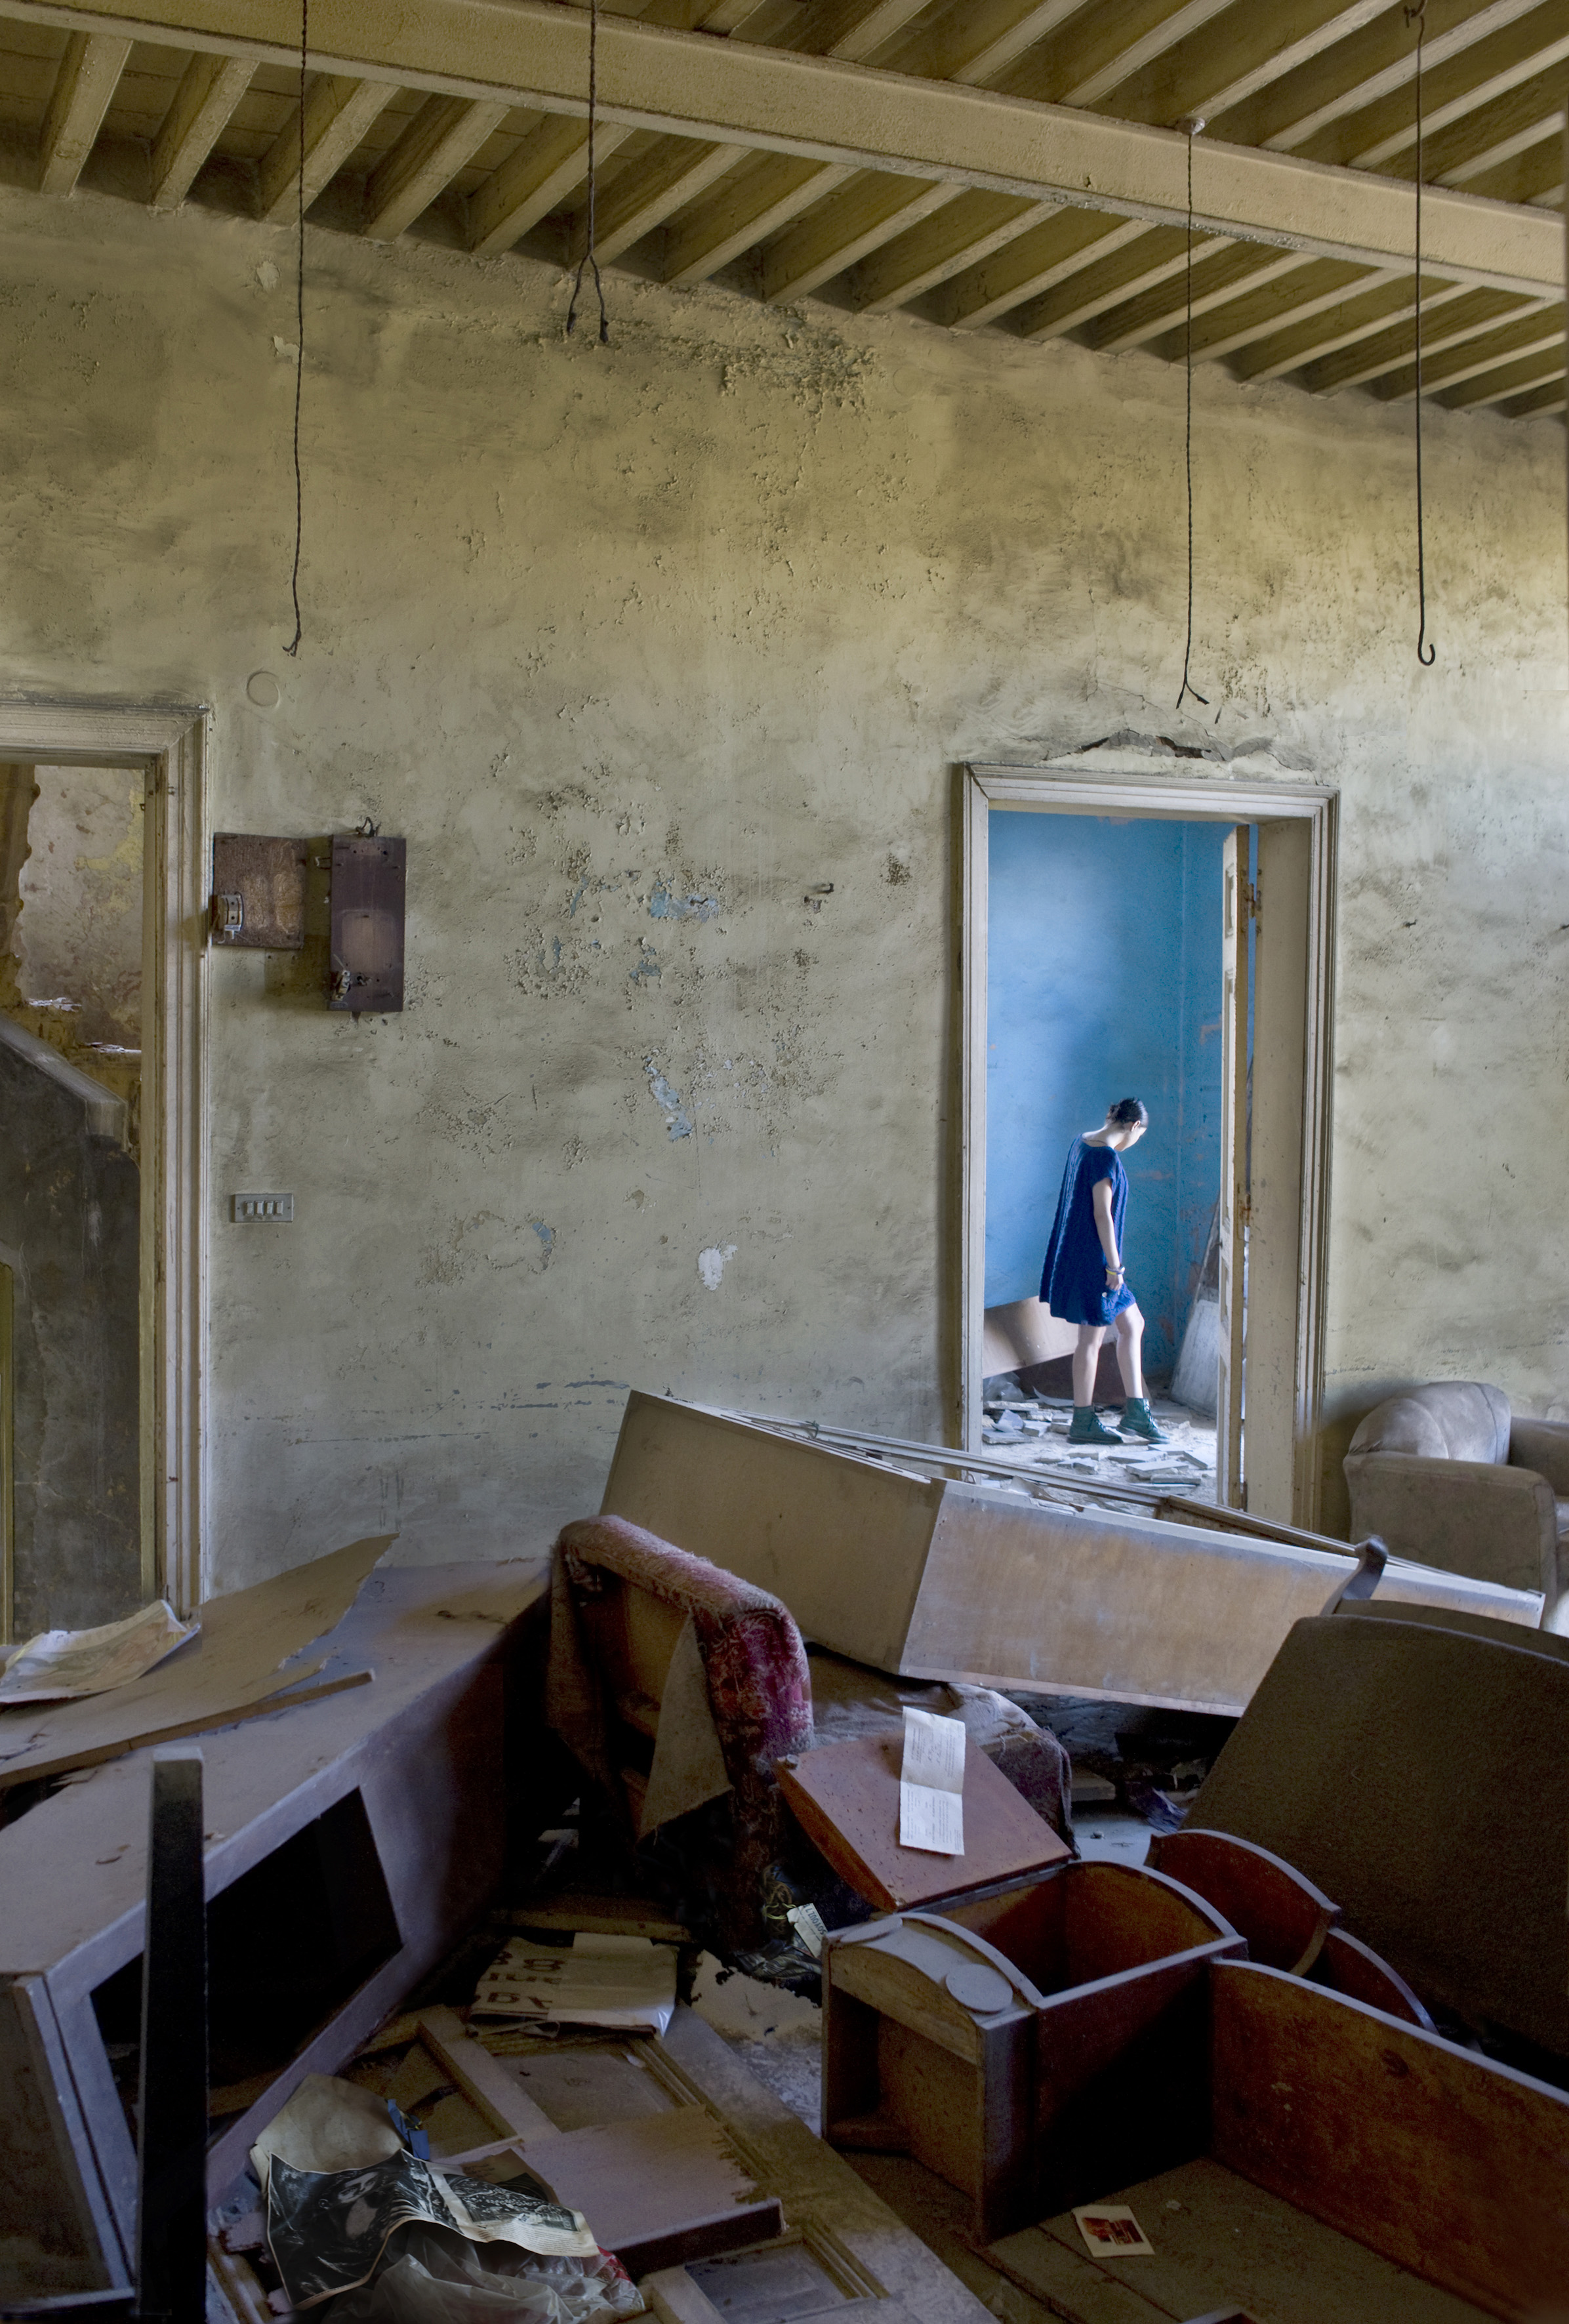 Grégory Buchakjian, Habitats abandonnés de Beyrouth, El Greco,  2011, photographie, © Grégory Buchakjian